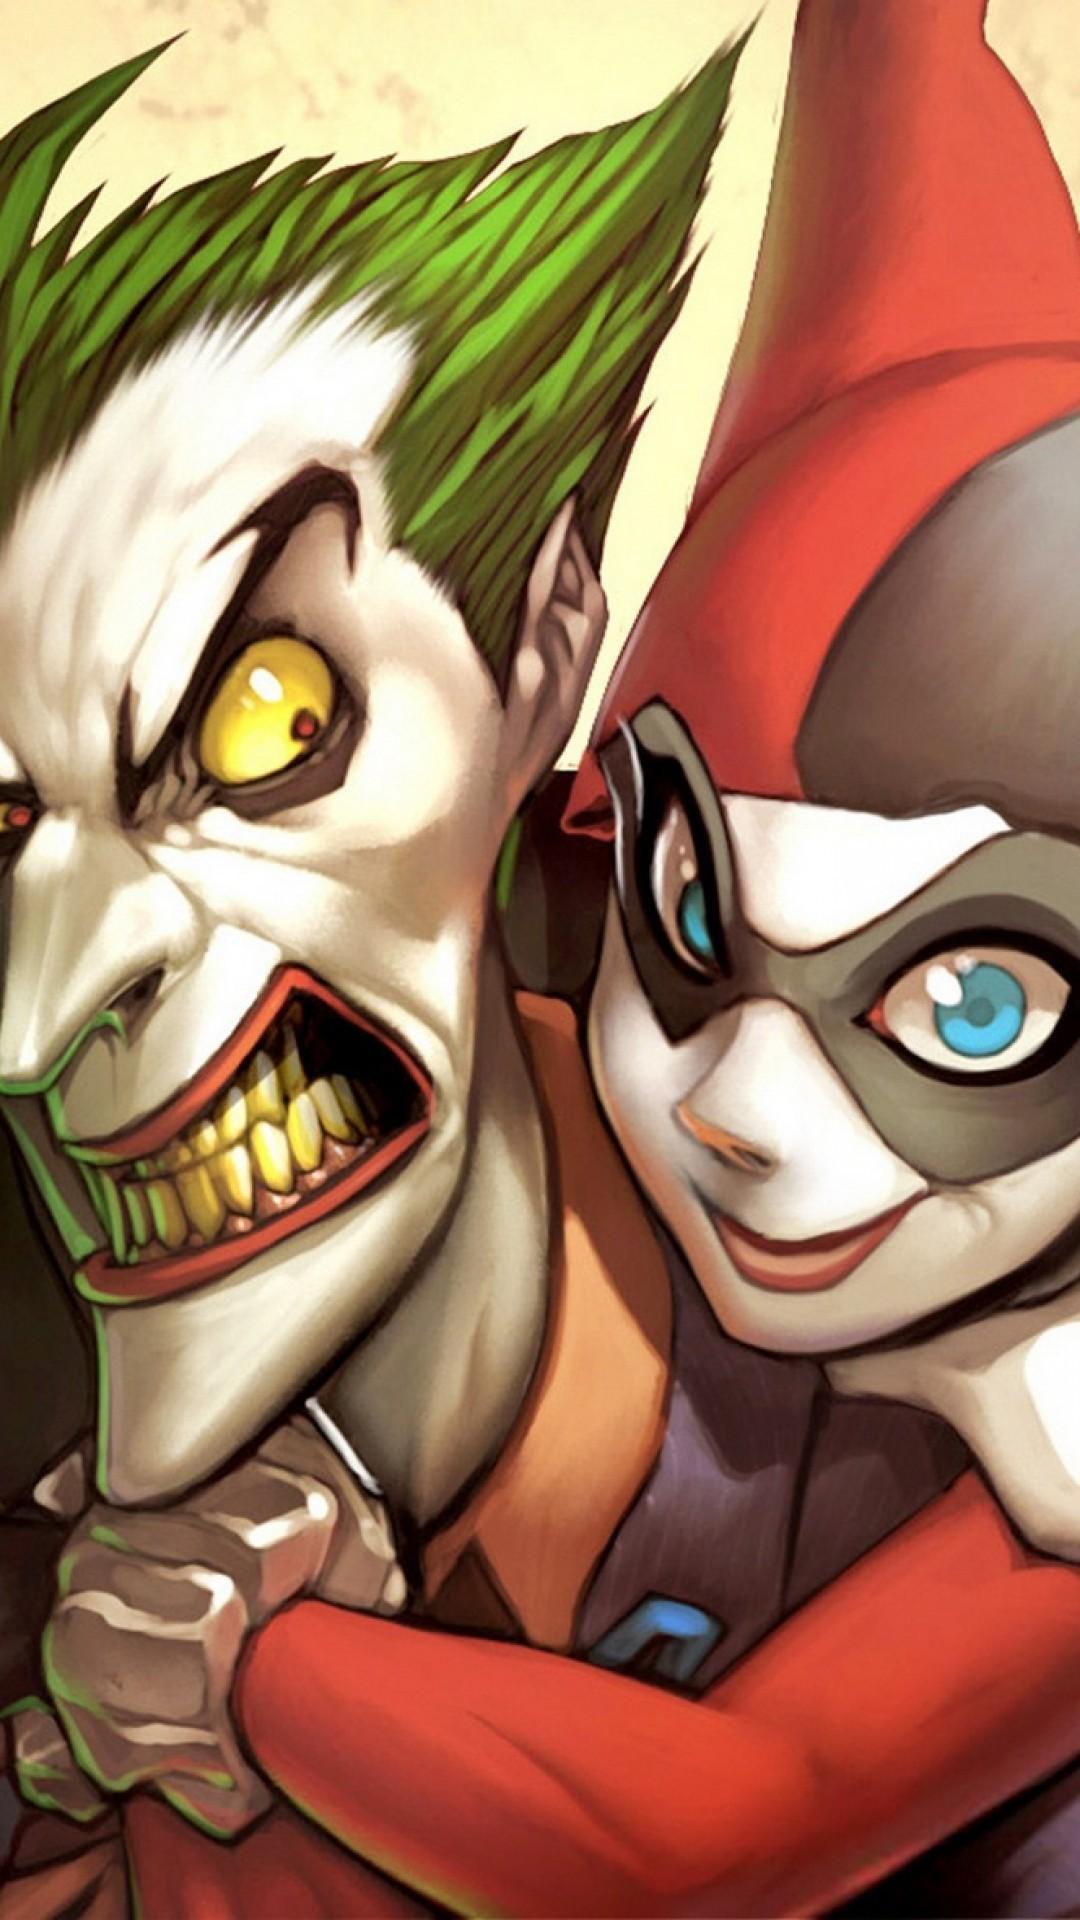 Joker Quotes Hd Wallpapers 1080p Joker Card Wallpapers 66 Images